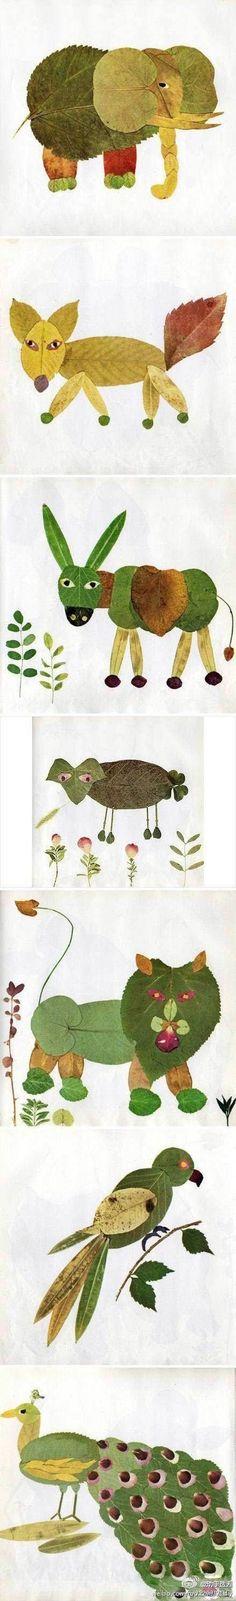 Vu sur pinterest : les feuilles d'arbre en Arts Visuels